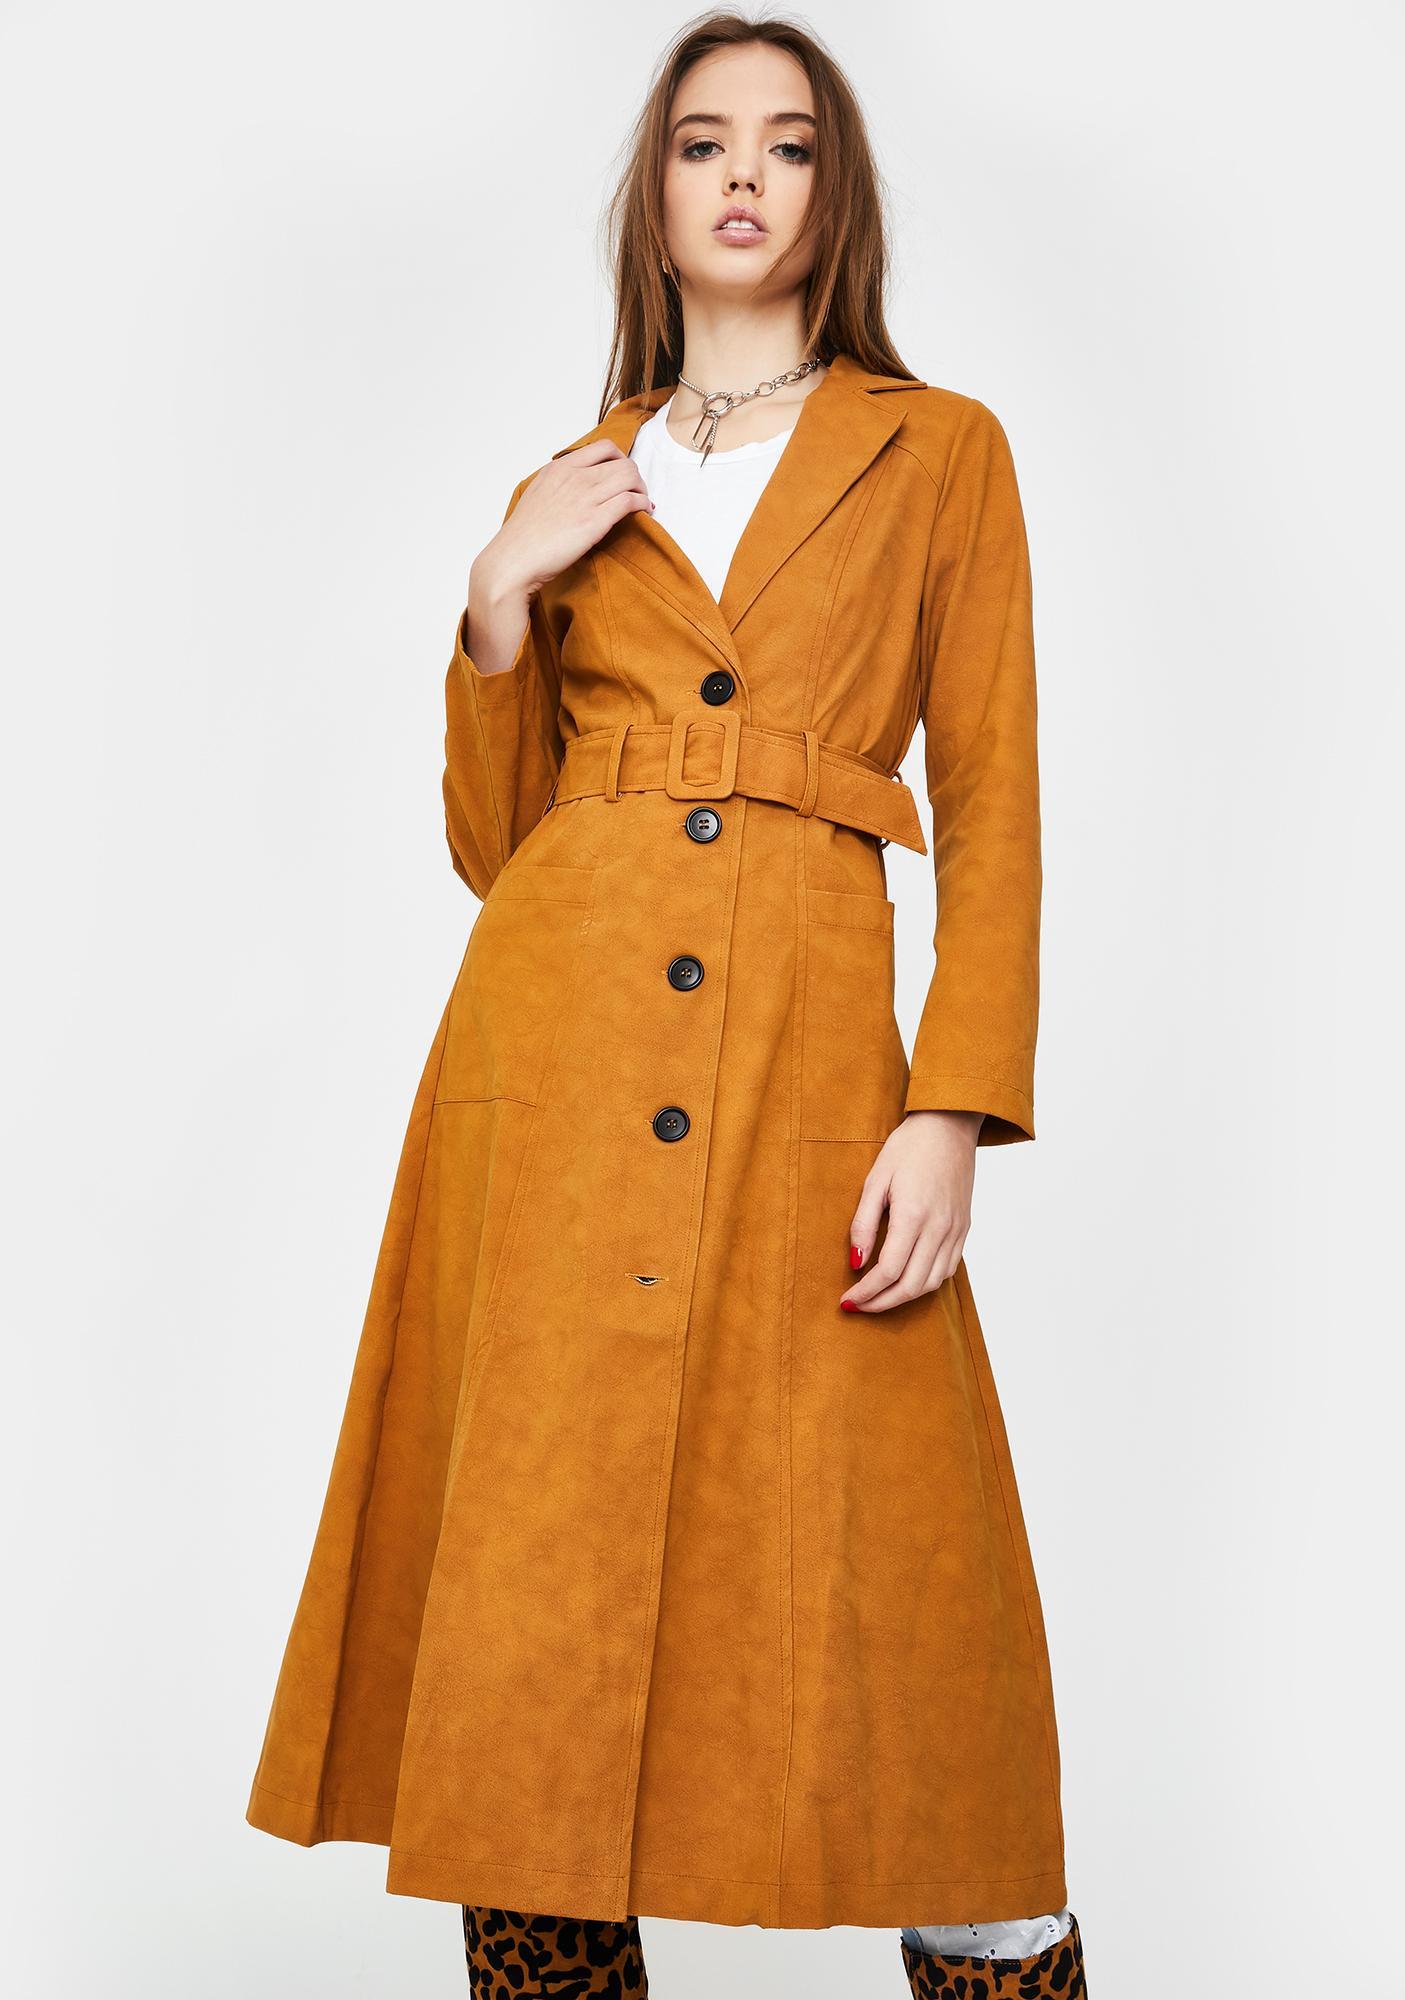 Honey Punch Cleo Trench Coat